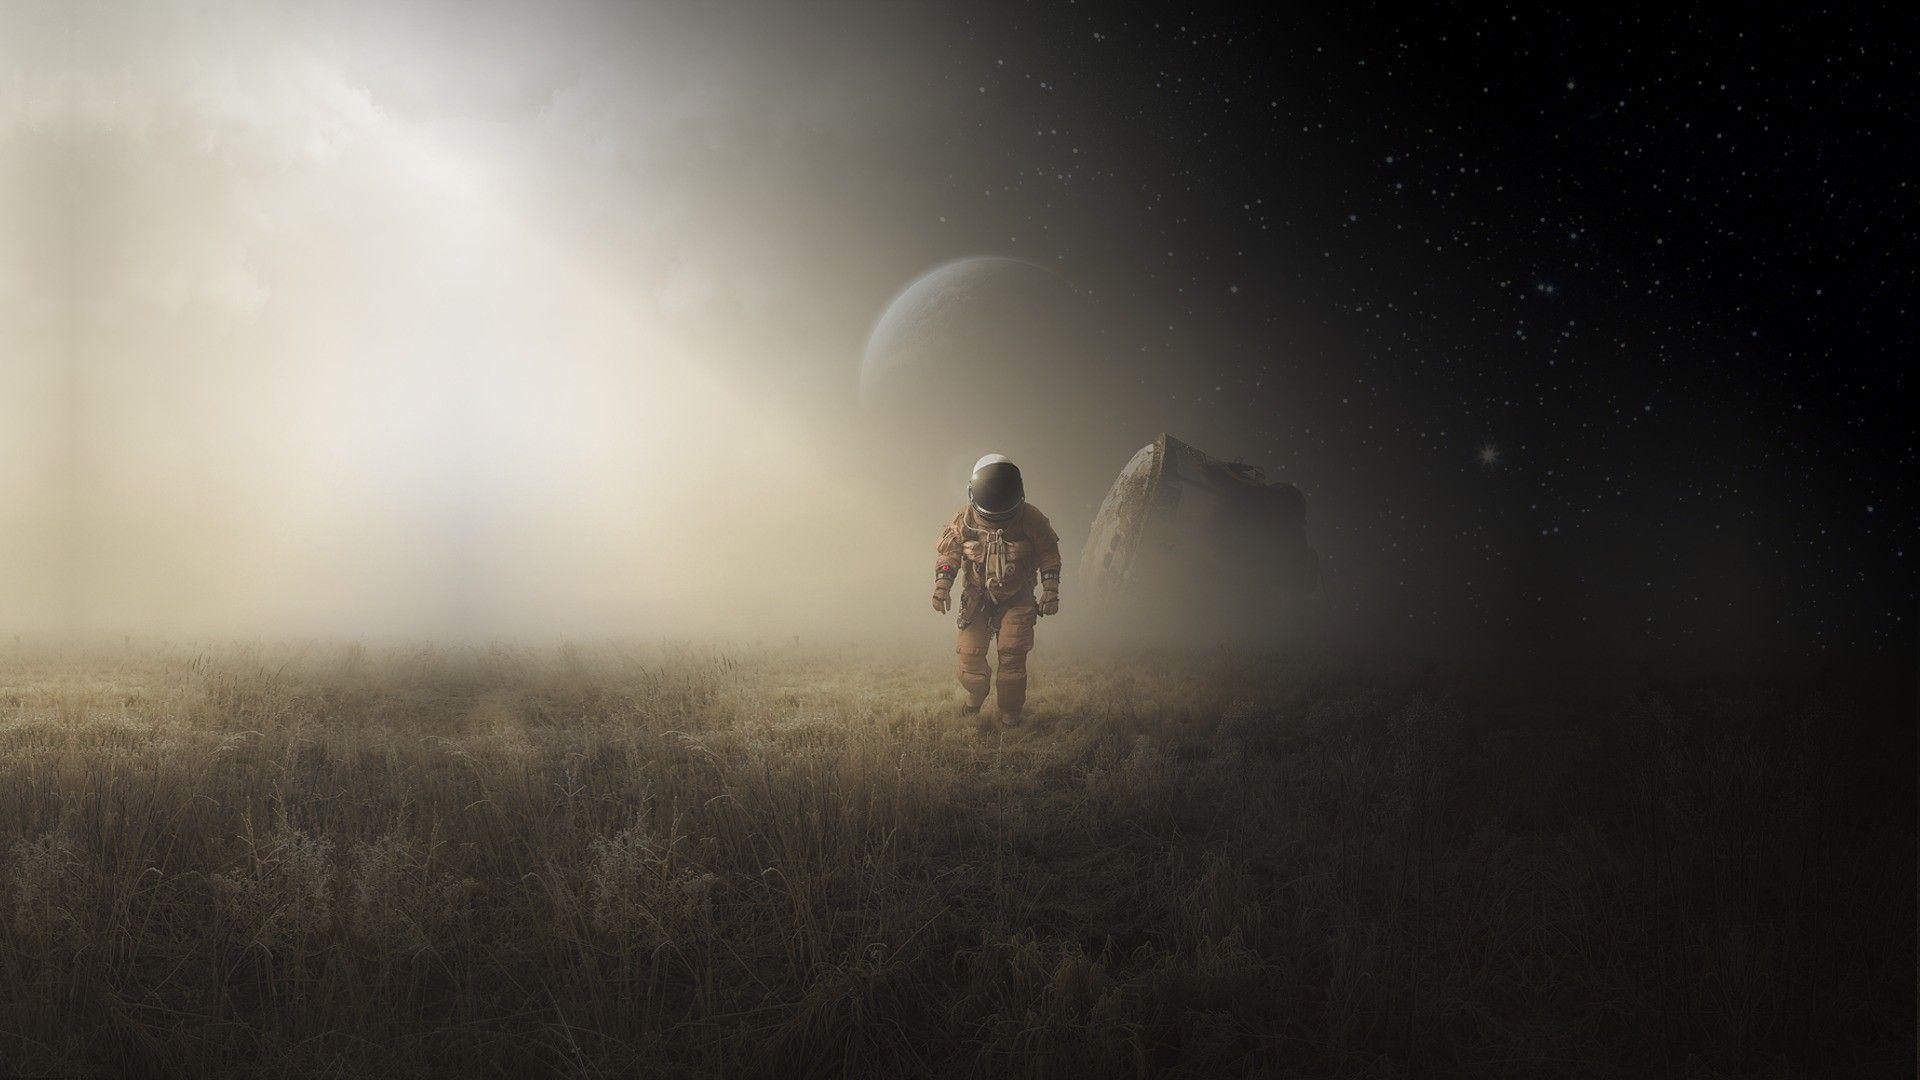 General 1920x1080 science fiction astronaut Michał